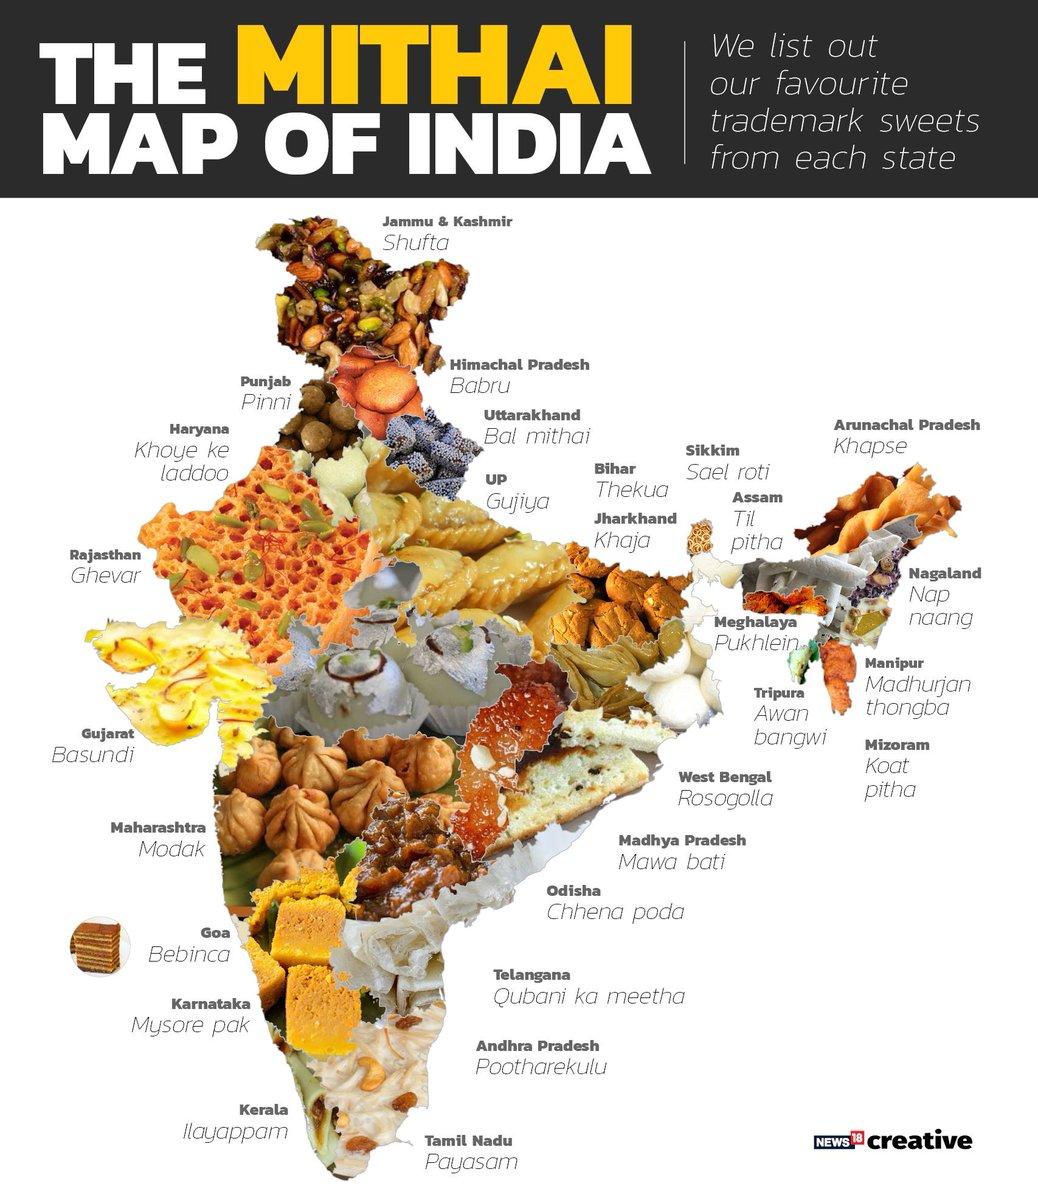 Nandita Iyer On Twitter How Sweet This Mithai Map Of India Via